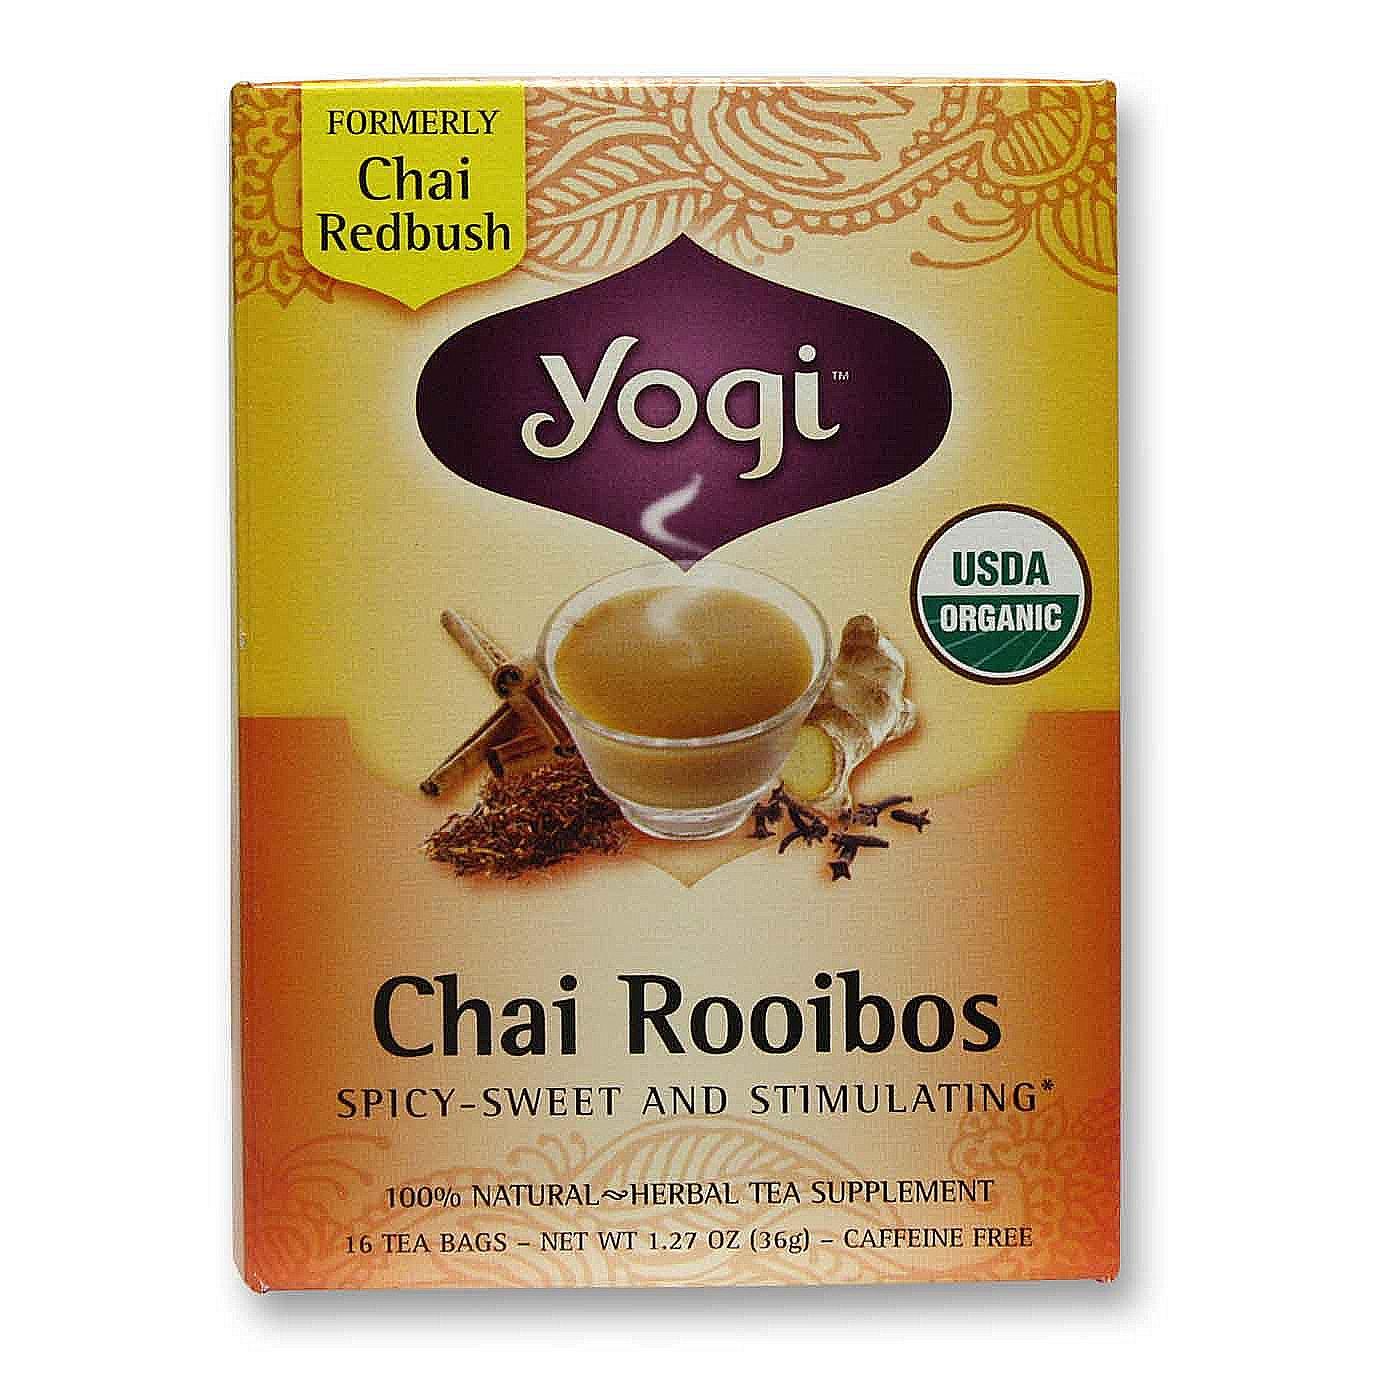 eVitamins.com: Yogi Tea Organic Teas Chai Rooibos - 16 Bags